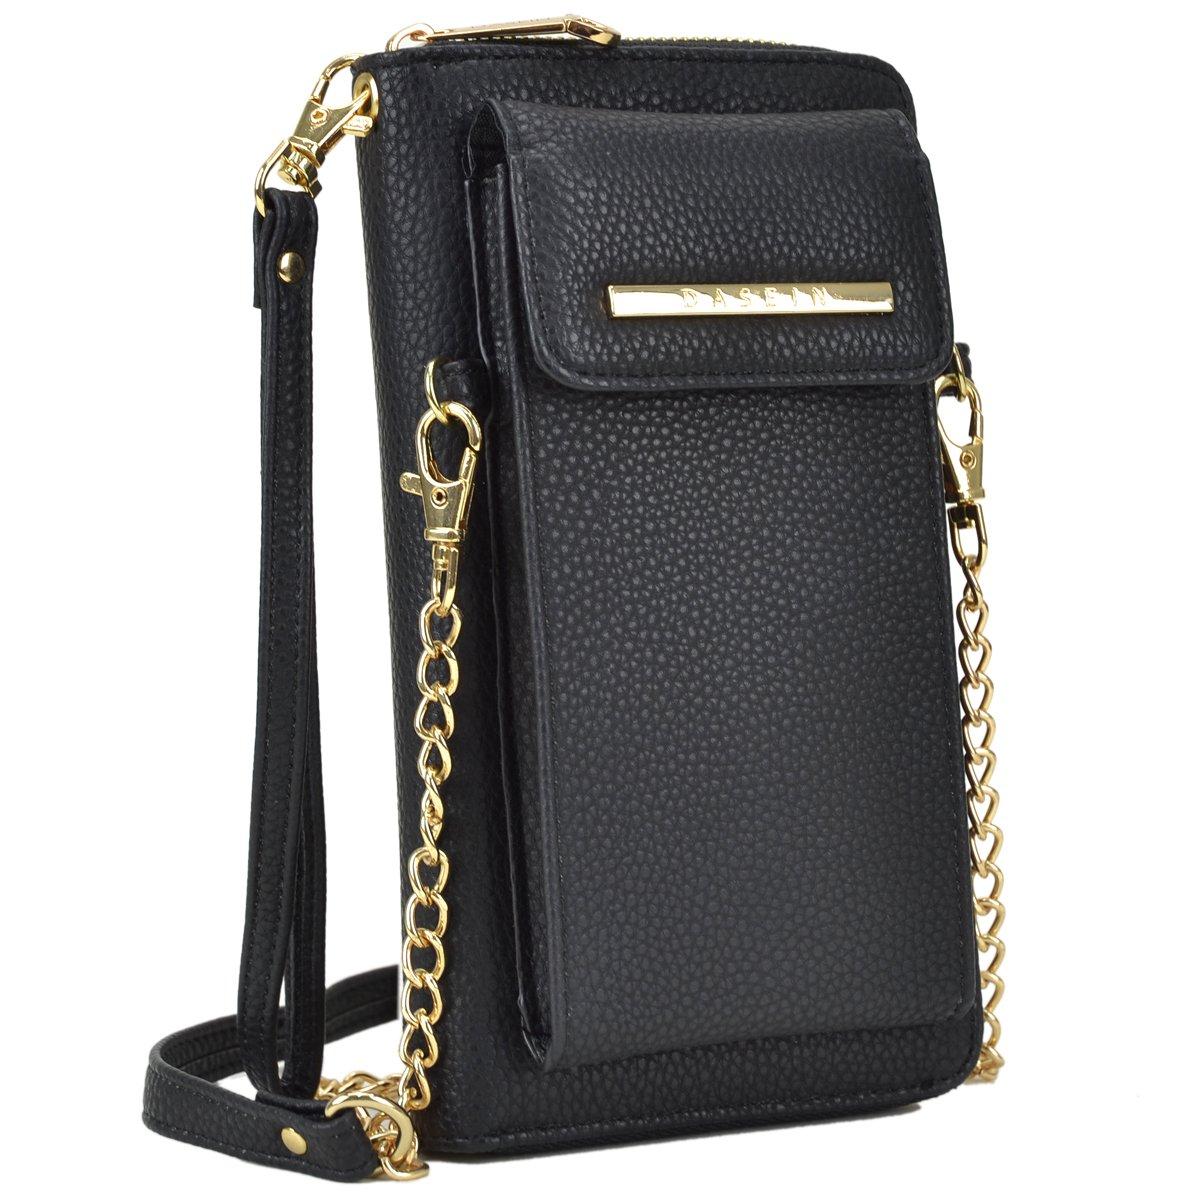 Cellphone Wallet Purse Phone Pouch Wristlet Clutch Crossbody Shoulder Bag - 12 Slots